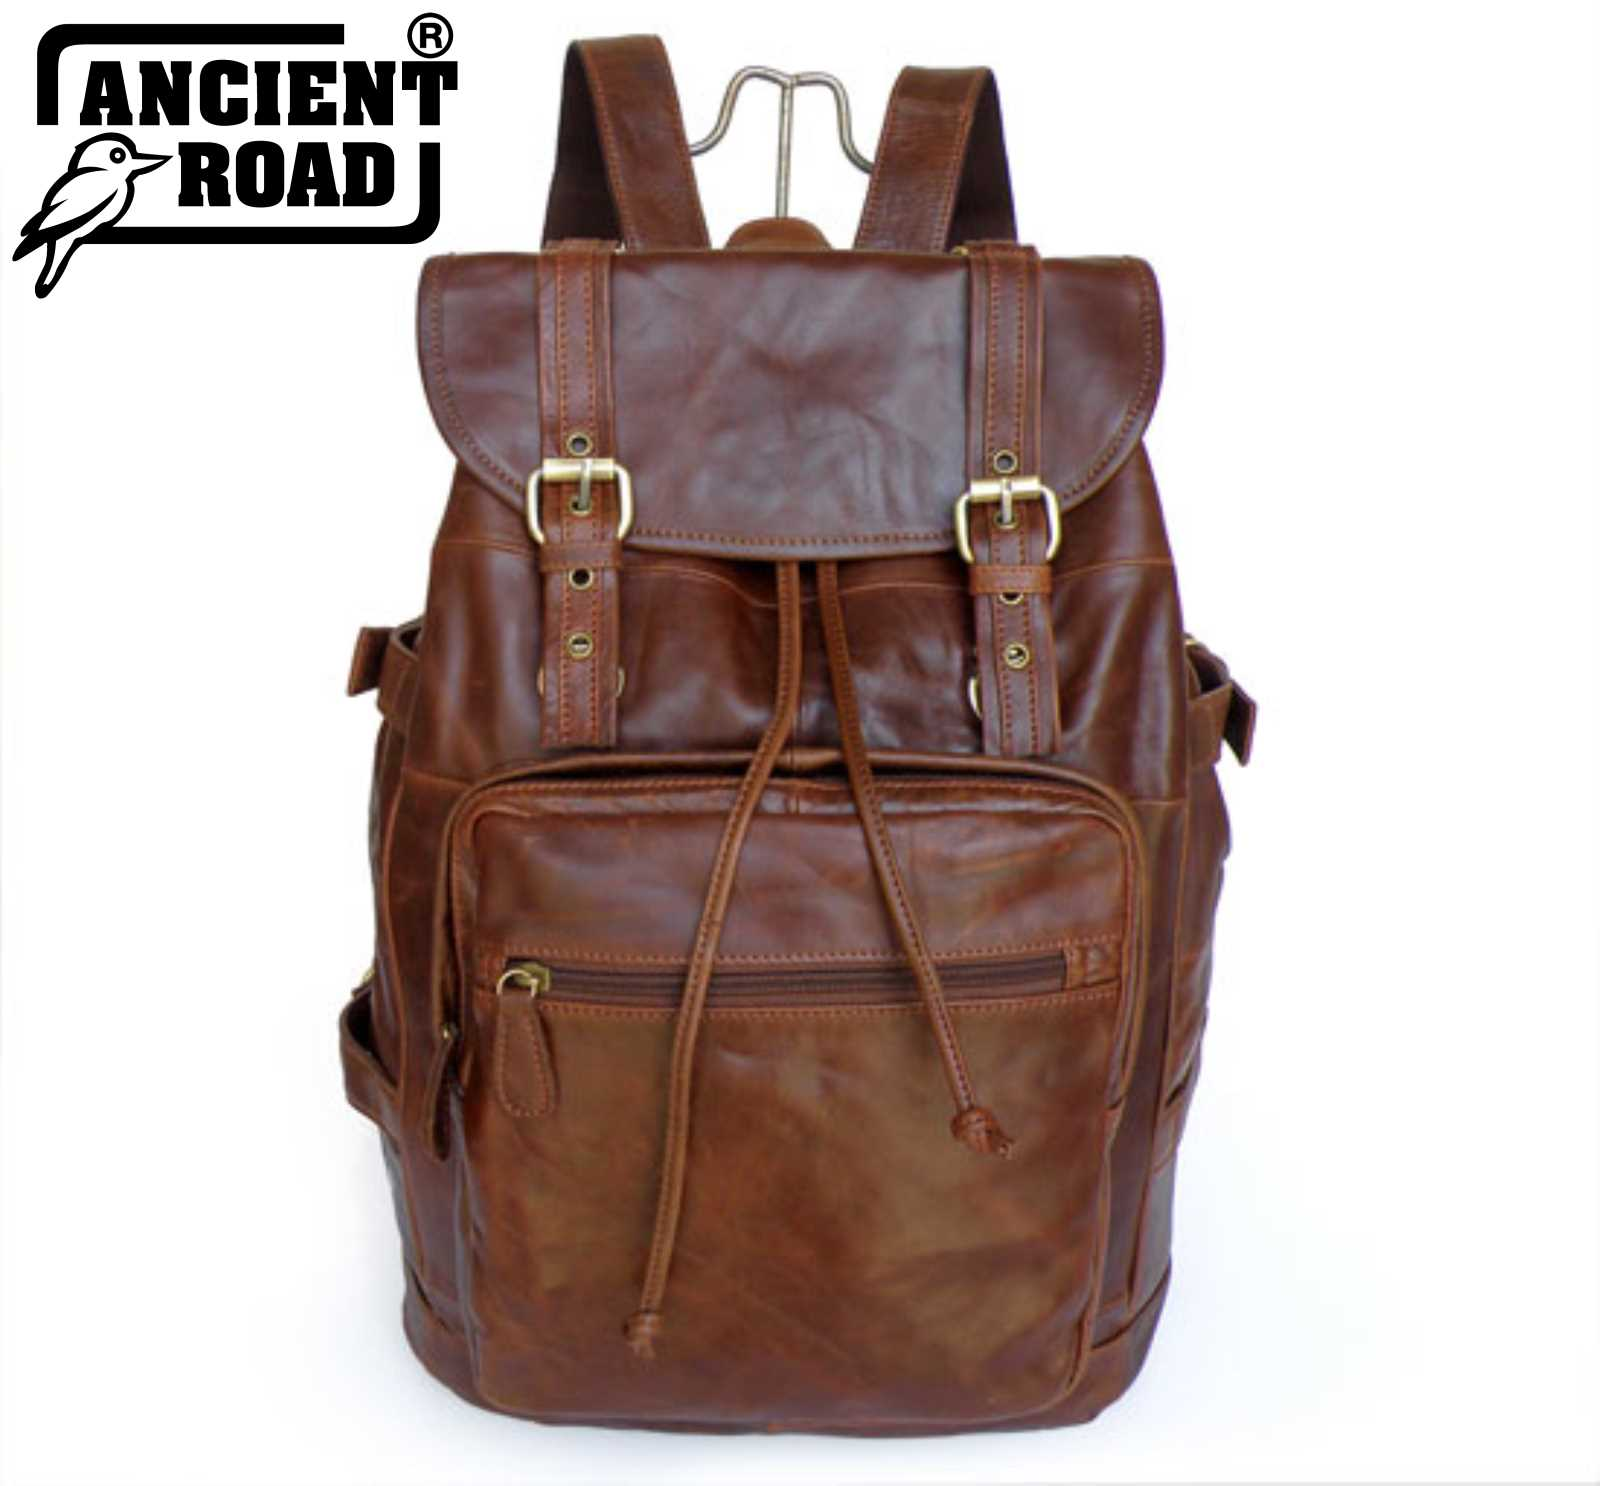 0a8f917e1a Details about ANCIENT ROAD Men s Handme Vintage 100% Genuine Leather  Backpack Travel Bag JM264